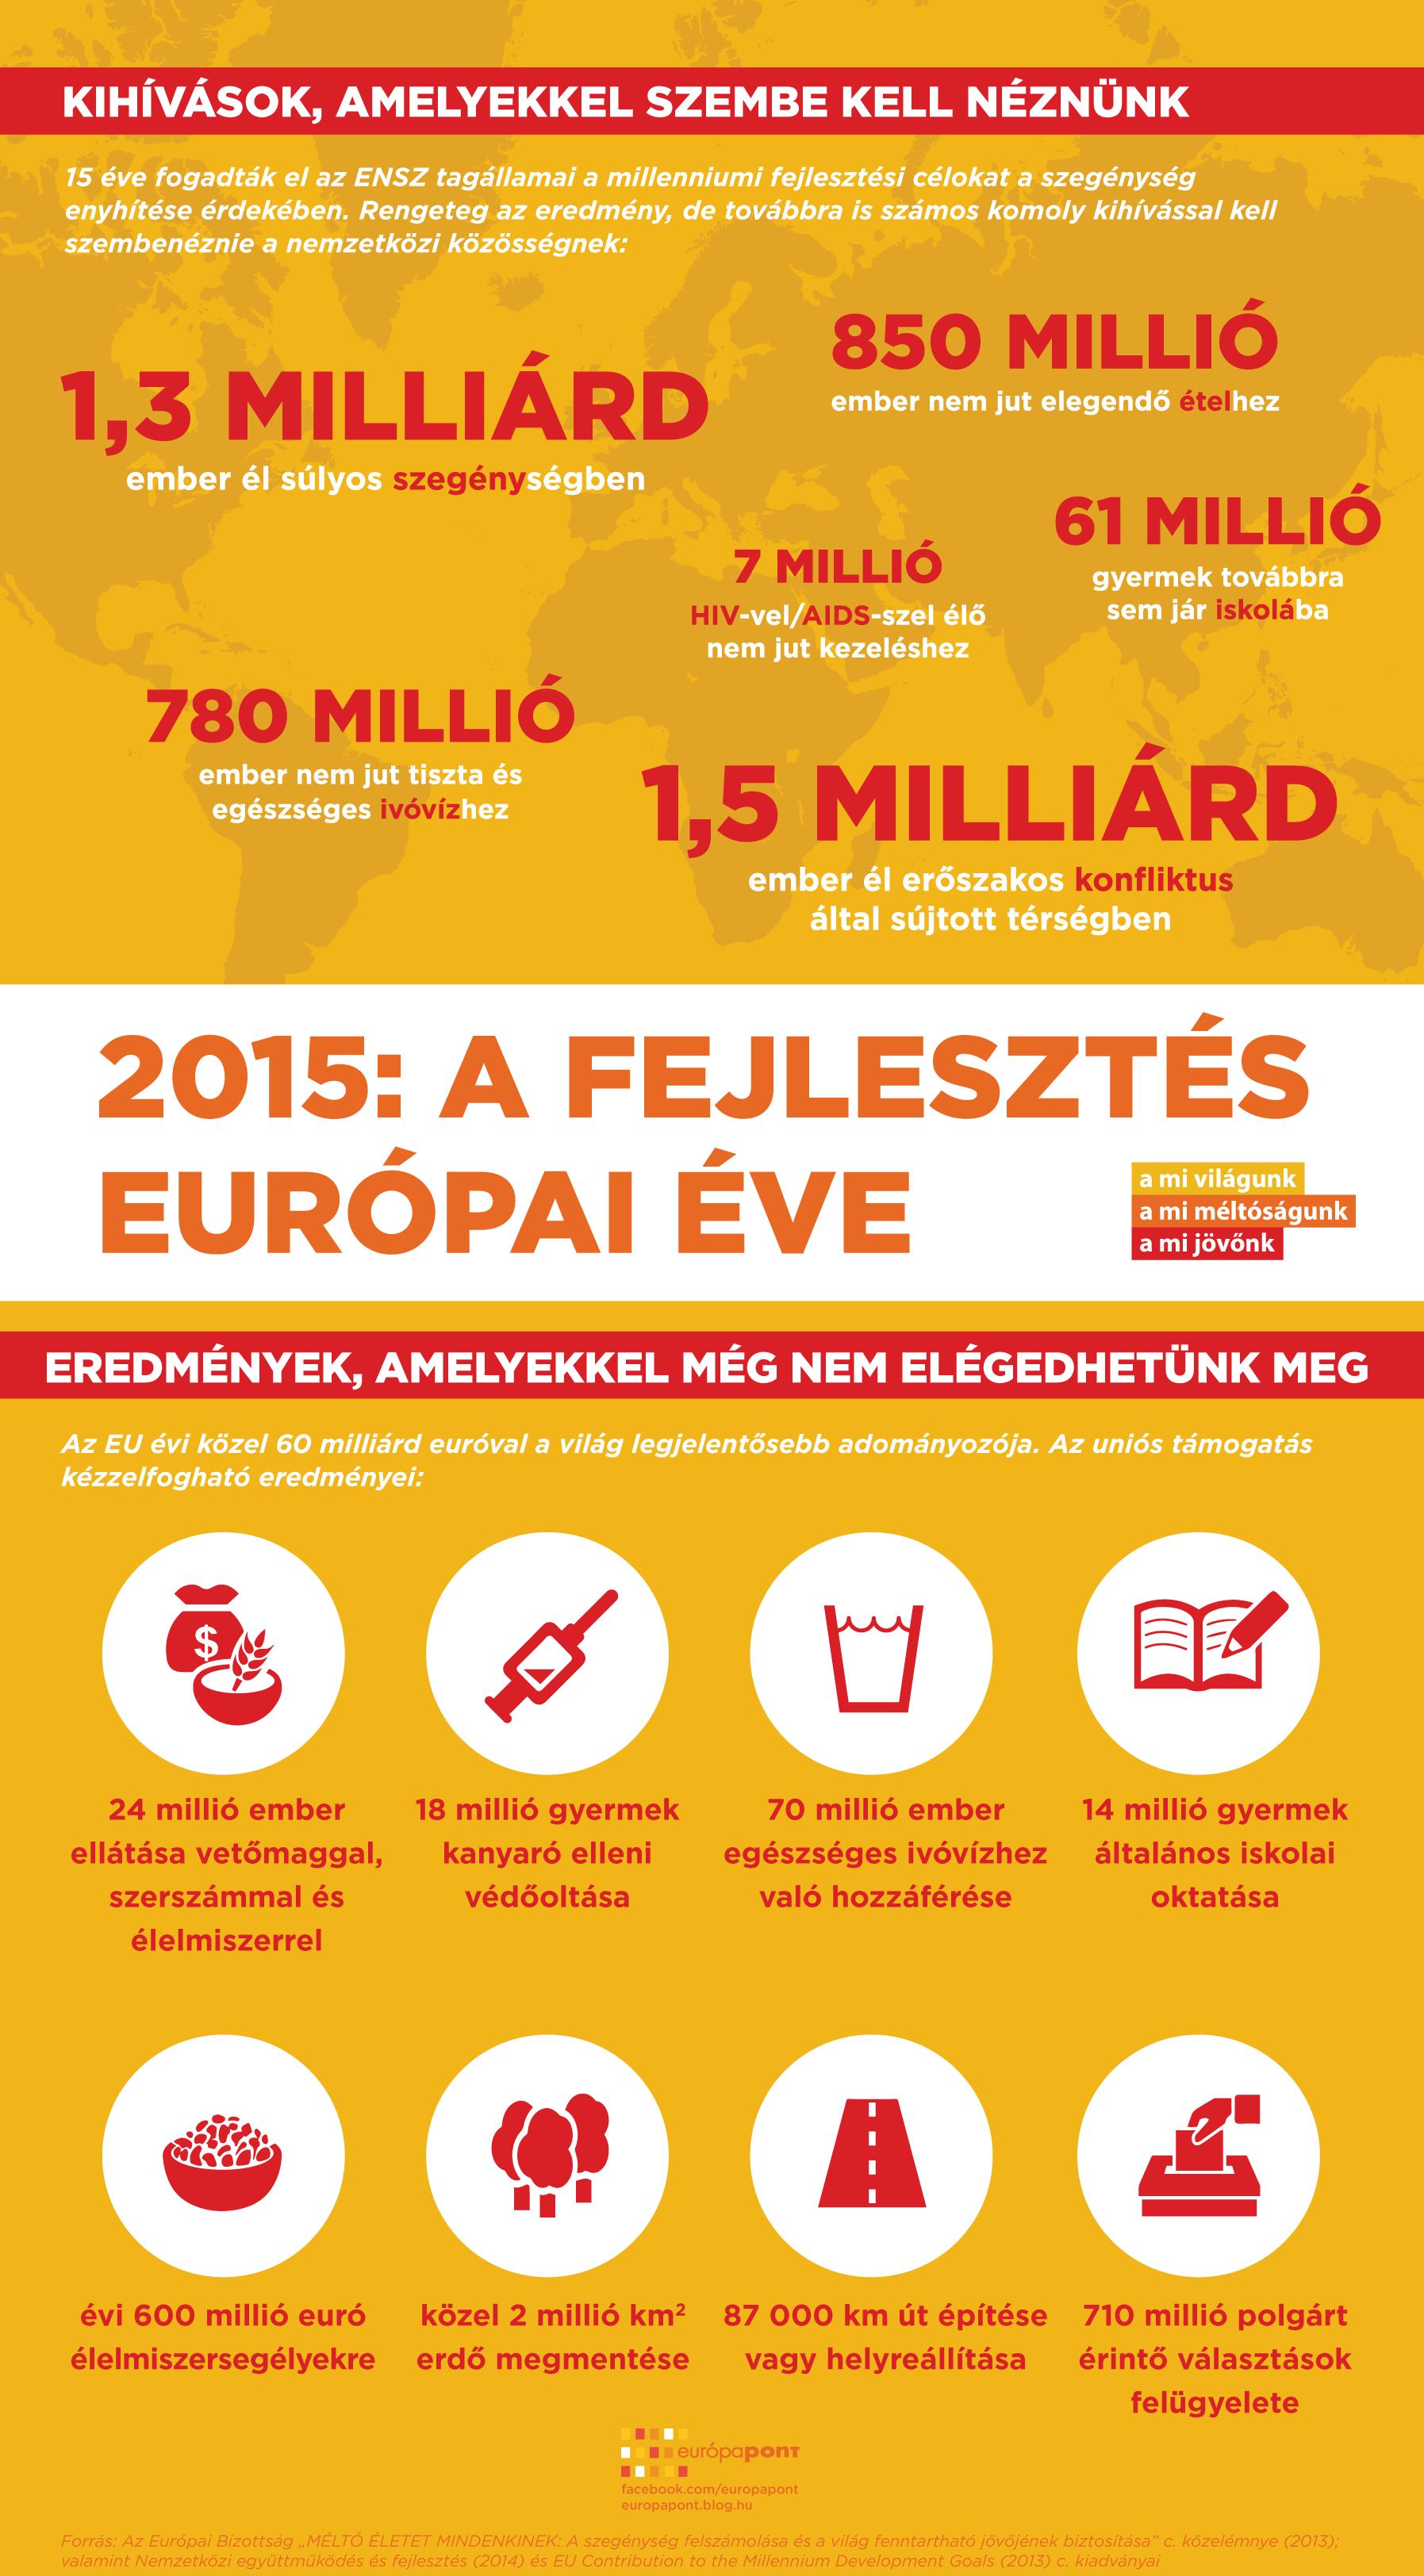 fejlesztes_europai_eve_infografika.png